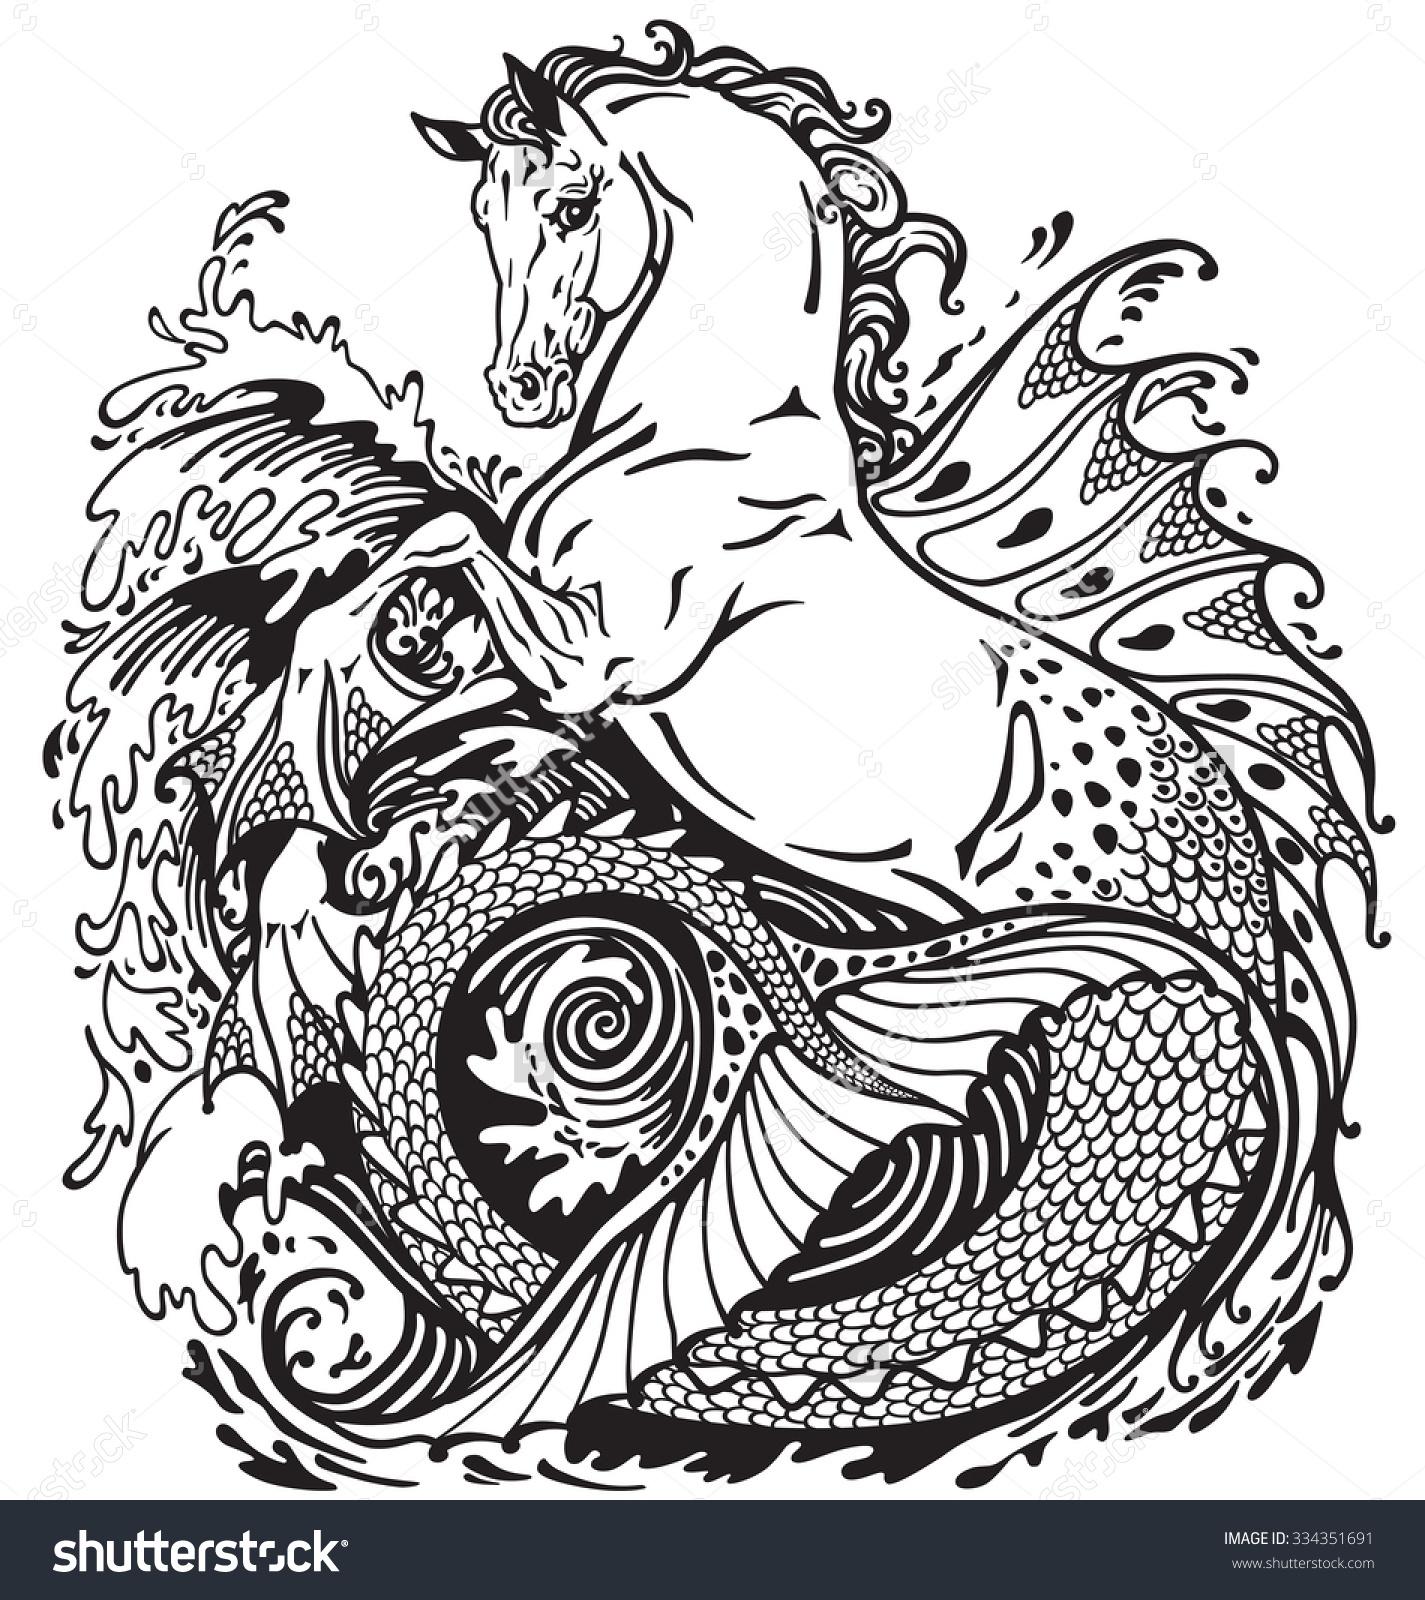 Kelpie coloring #15, Download drawings